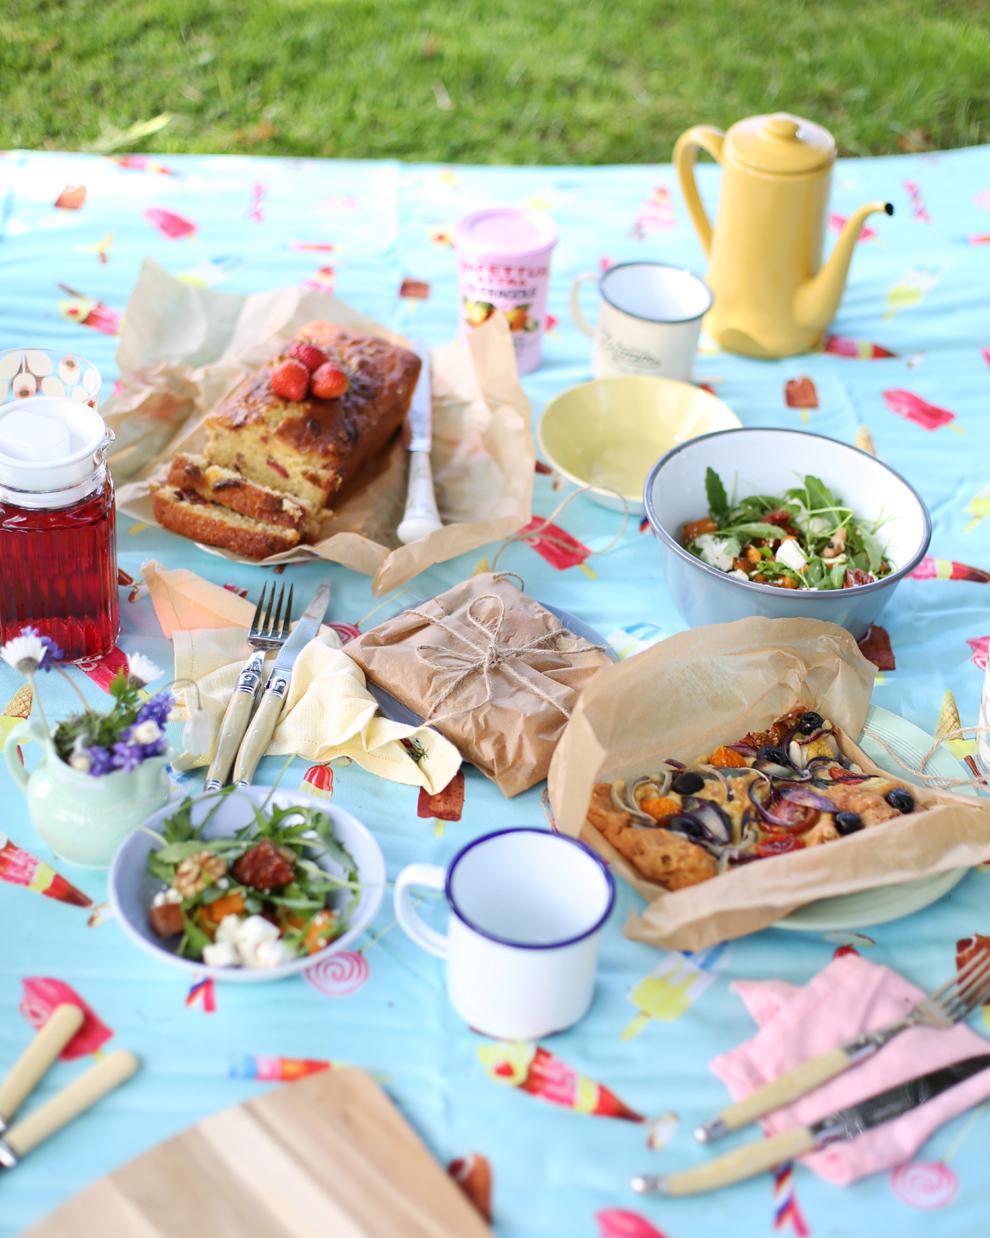 Picnic-food-ideas